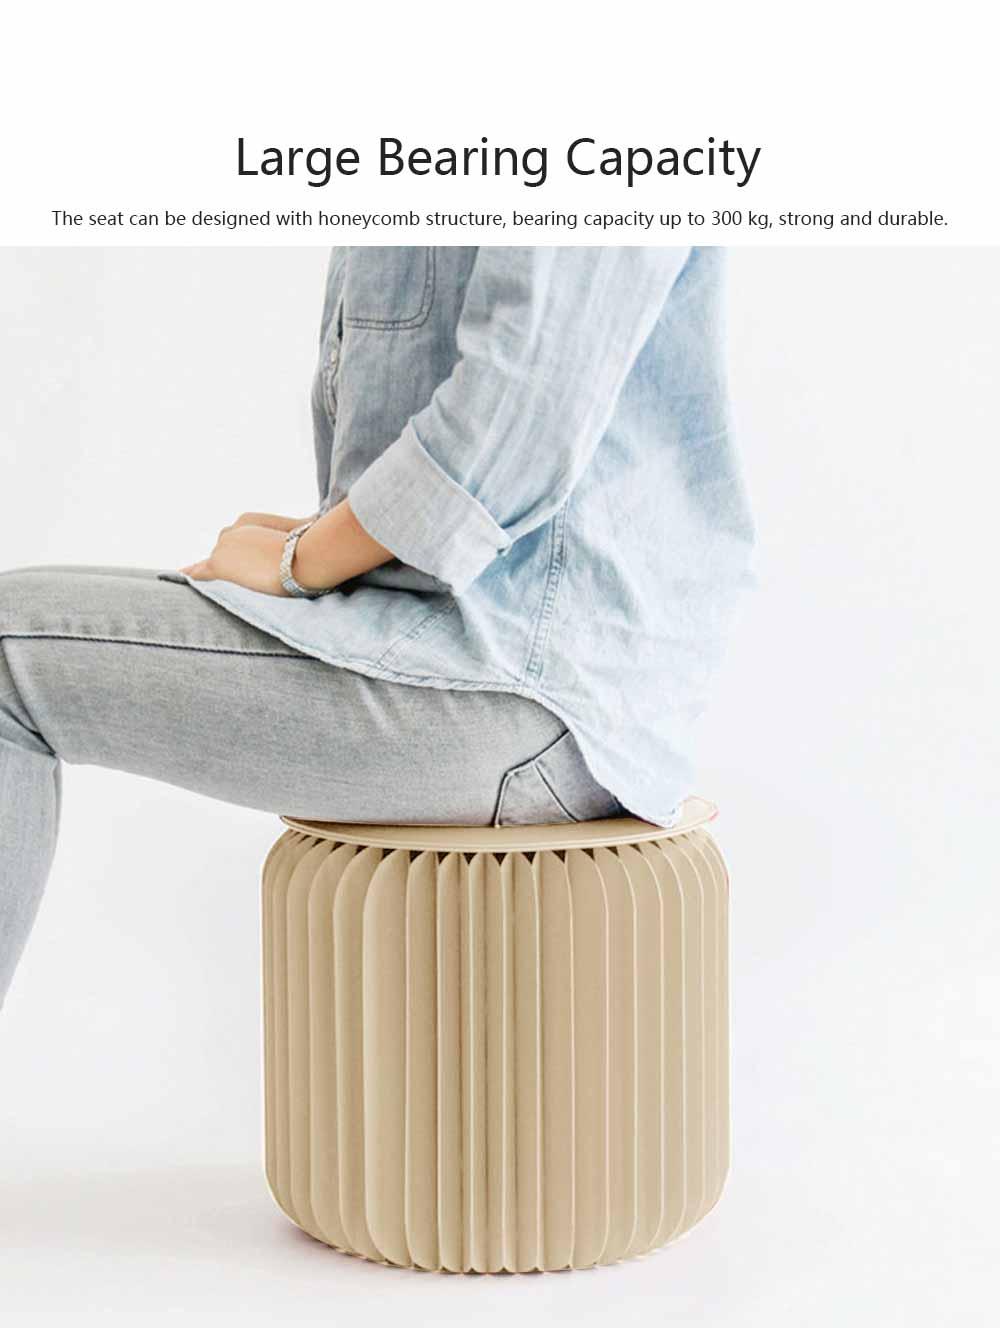 Portable Creative Folding Kraft Stool with High Load Bearing Capacity Kraft Sofa Single Stool Waterproof 5